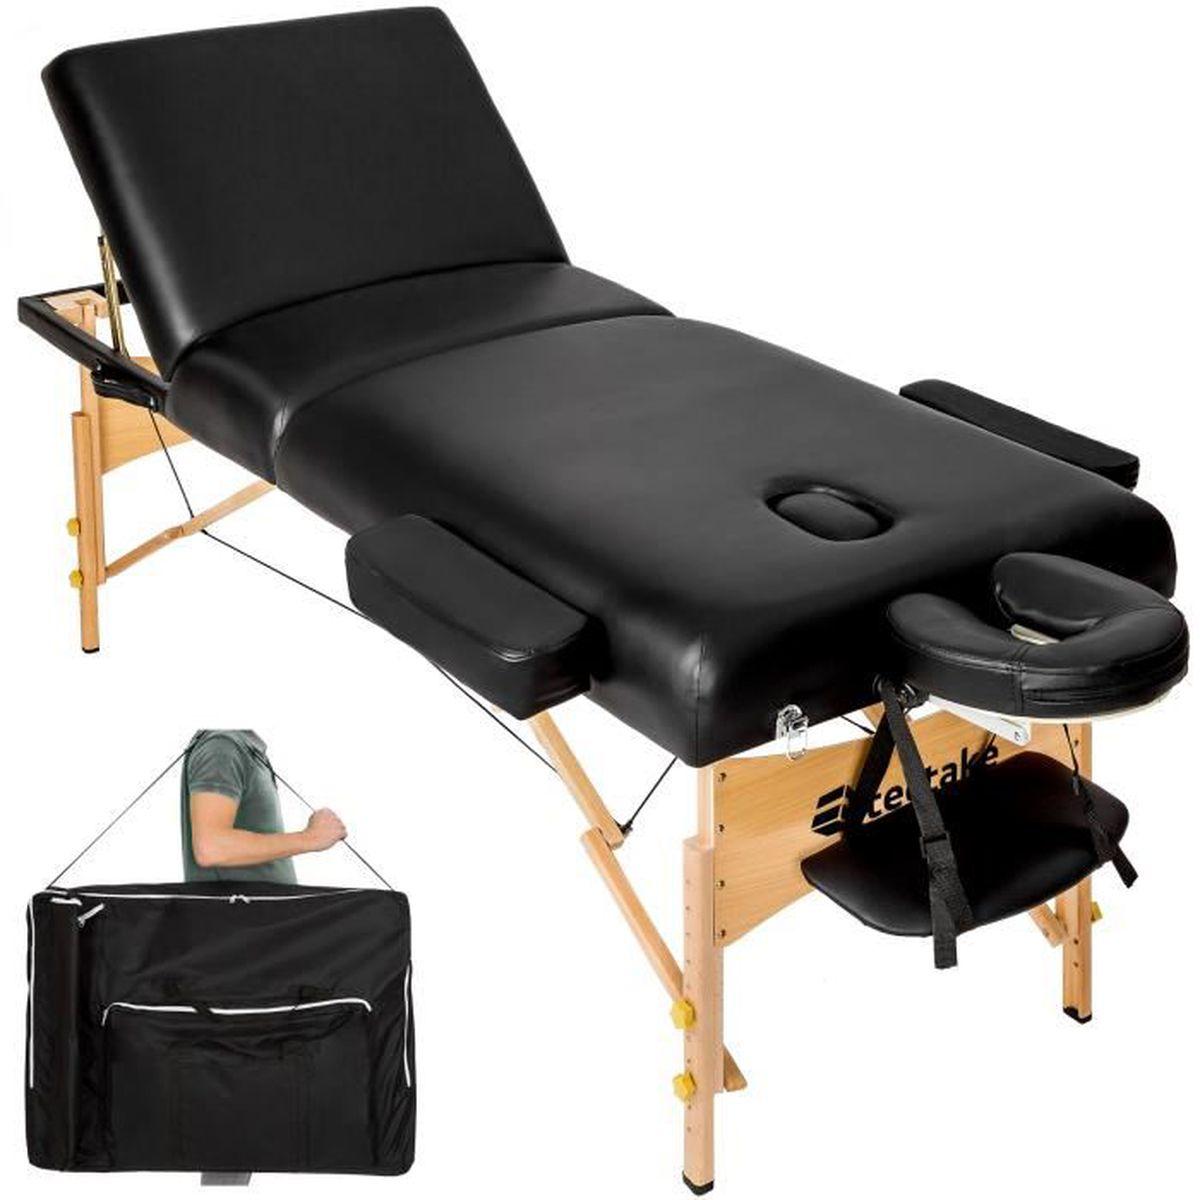 Table de massage TECTAKE Table de Massage Pliante 3 Zones Noir + Ho